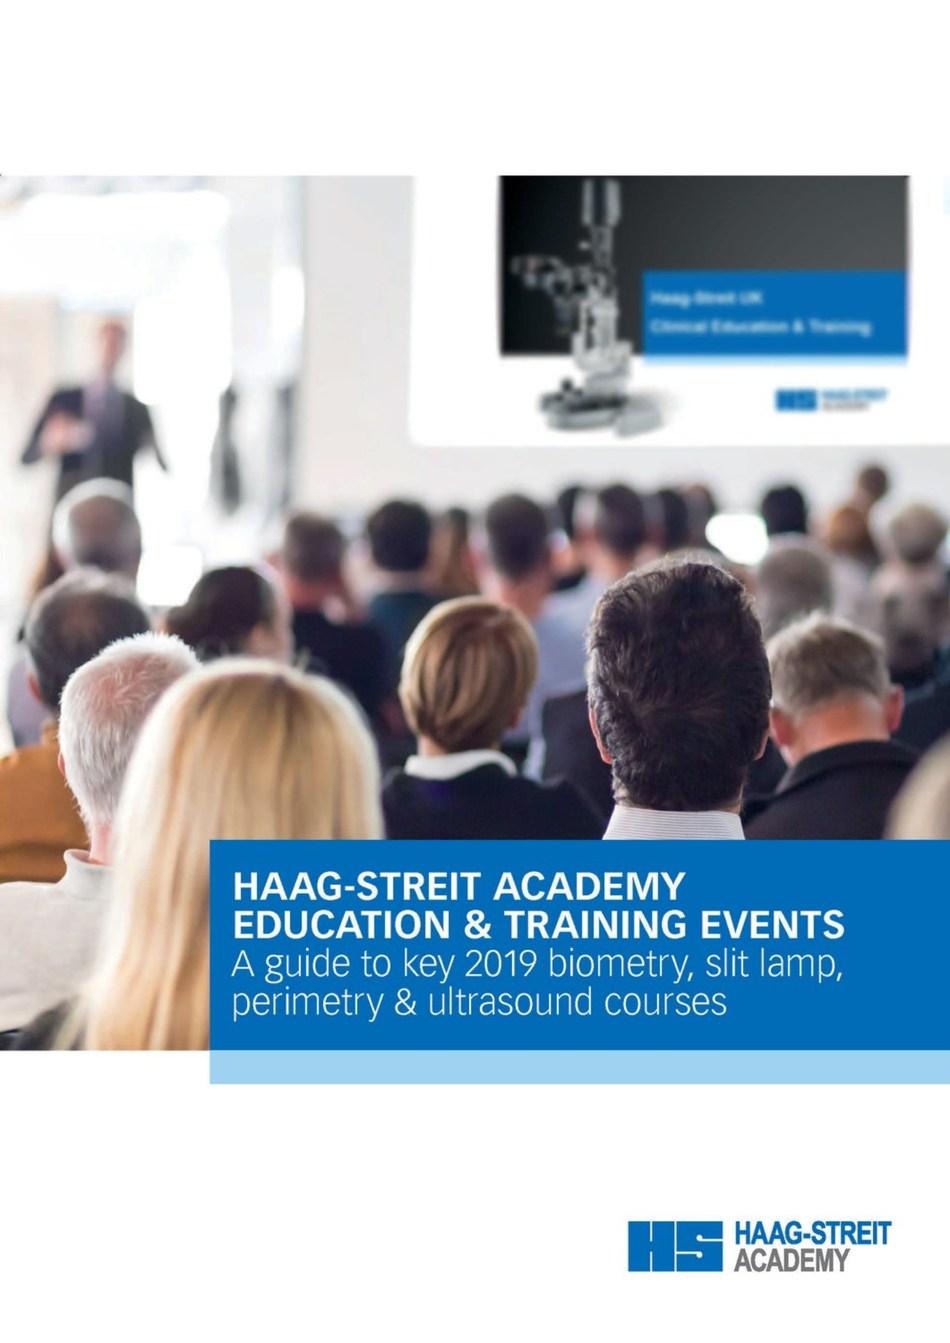 Haag-Streit Academy 2019 Education brochure and calendar (PRNewsfoto/Haag-Streit UK)